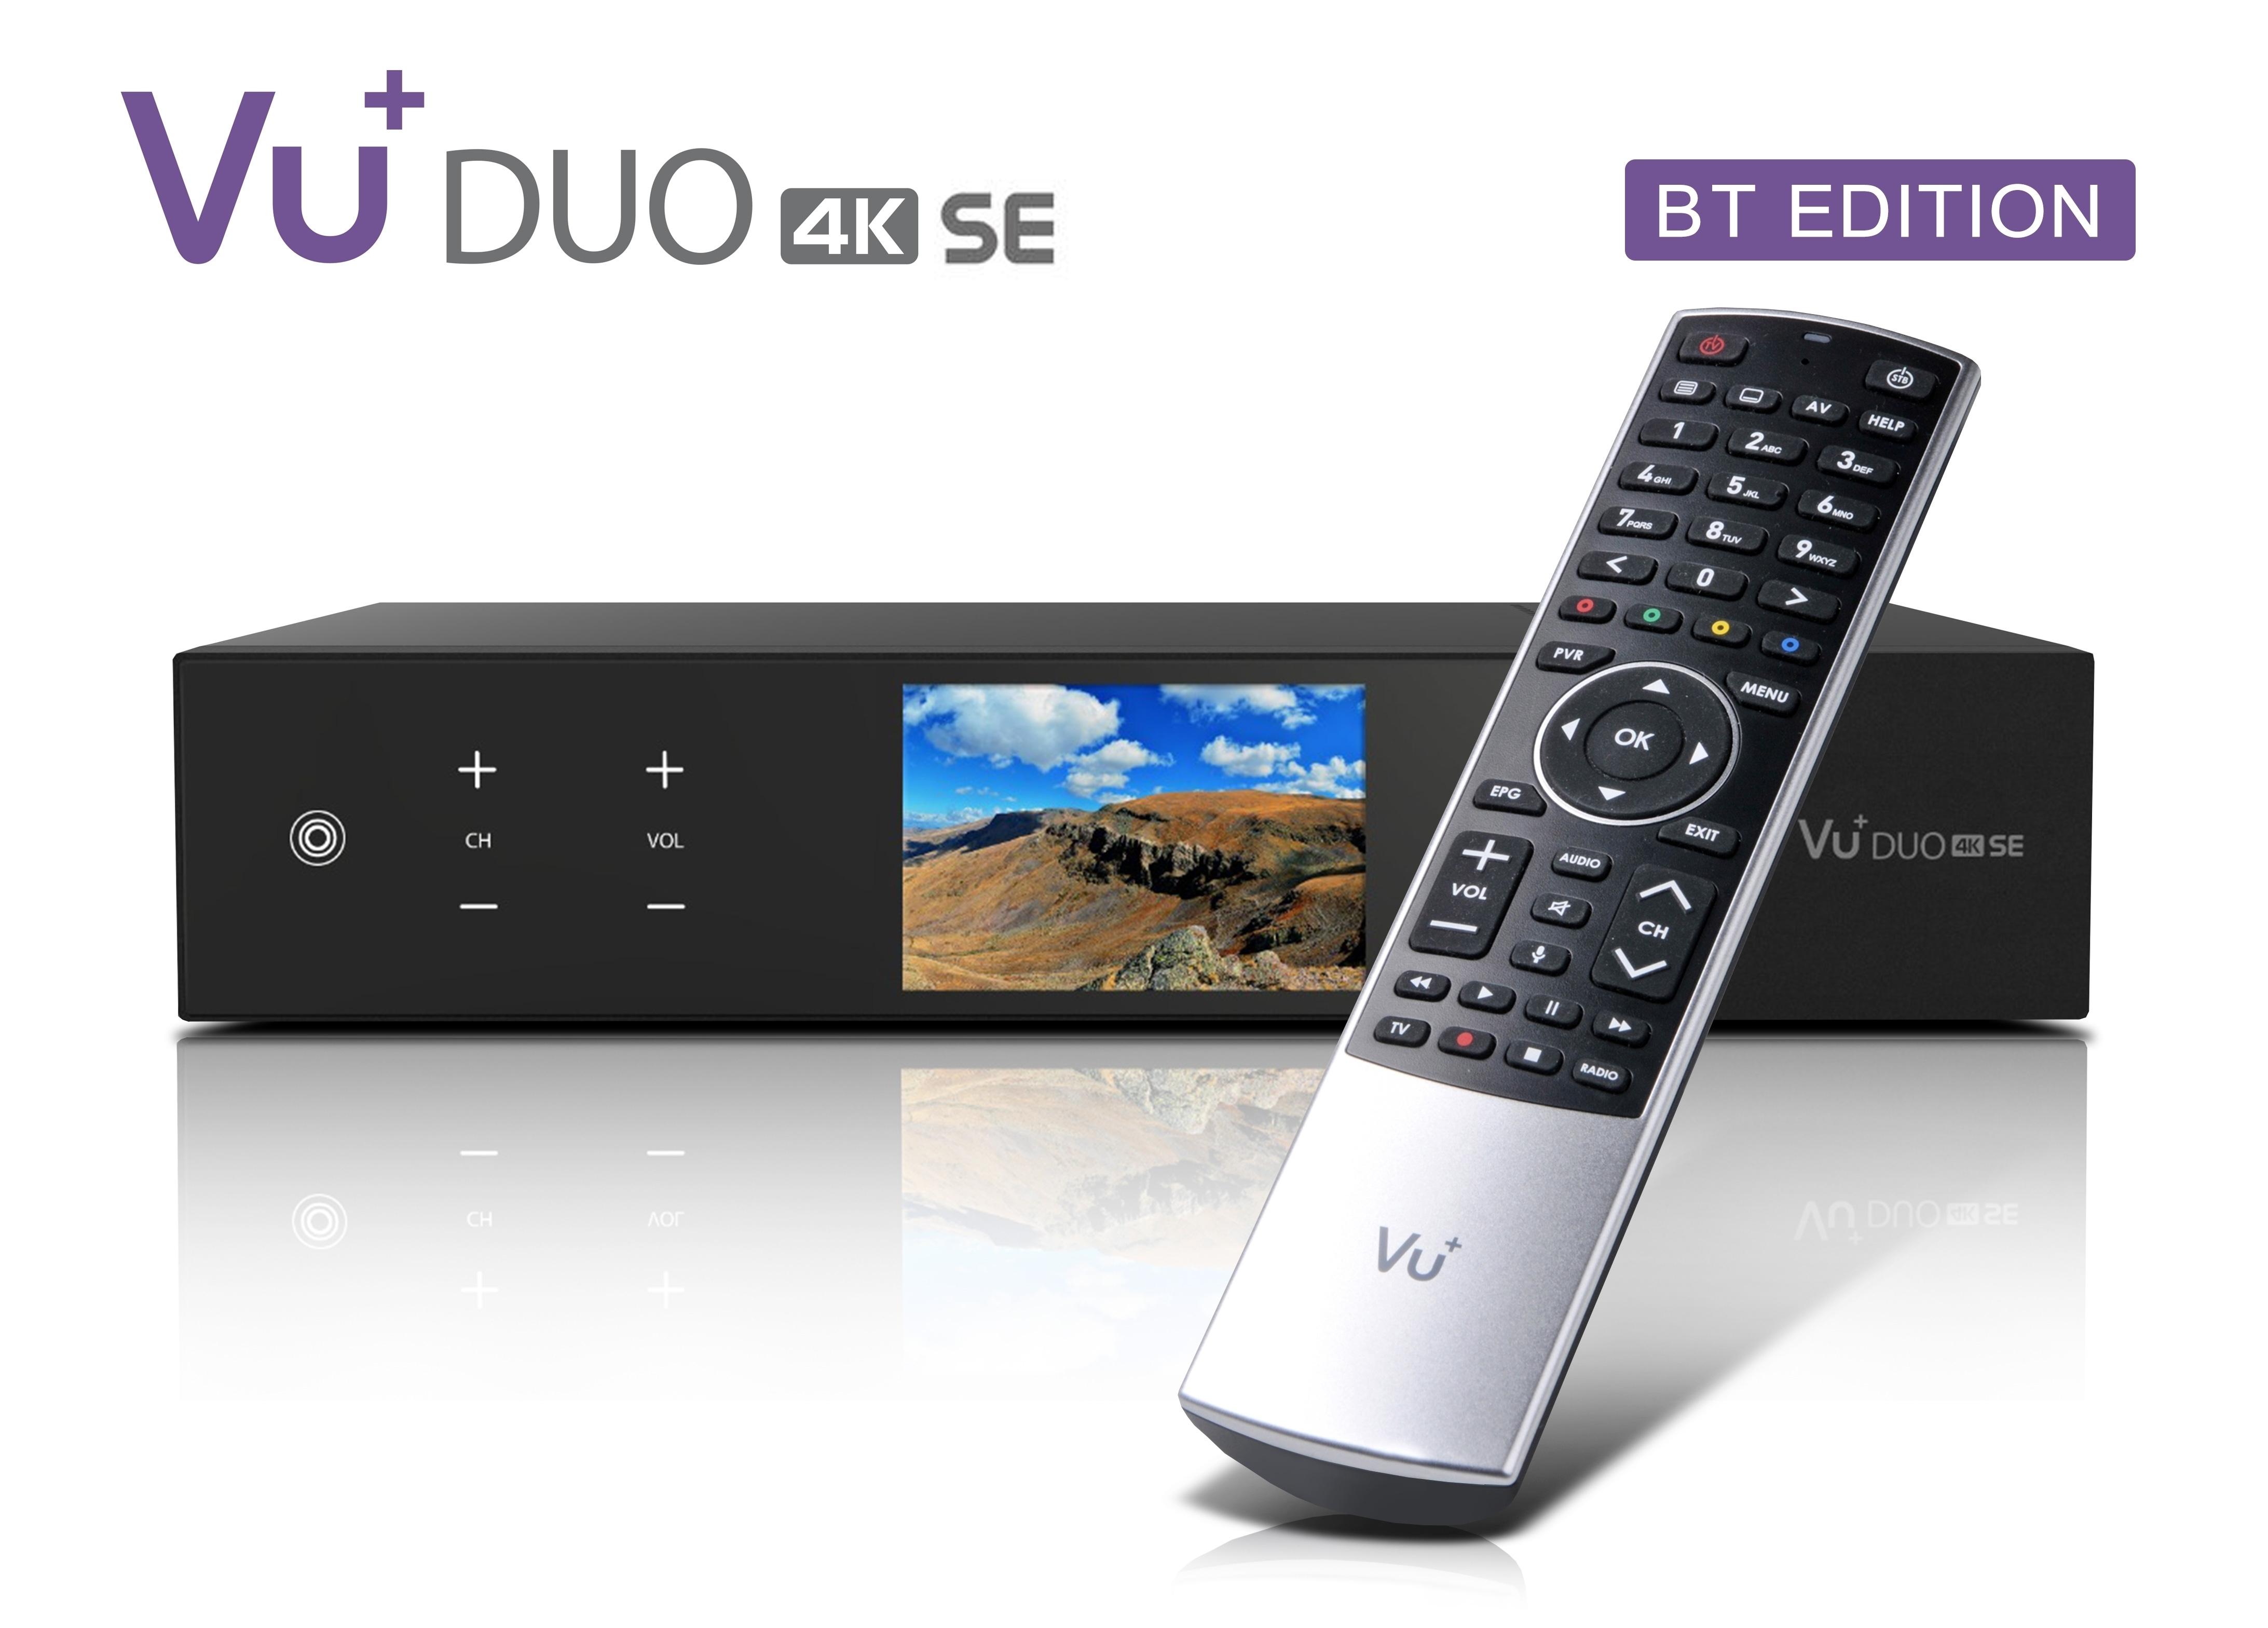 VU+ Duo 4K SE BT 1x DVB-S2X FBC Twin / 1x DVB-C FBC Tuner 1 TB HDD Linux Receiver UHD 2160p